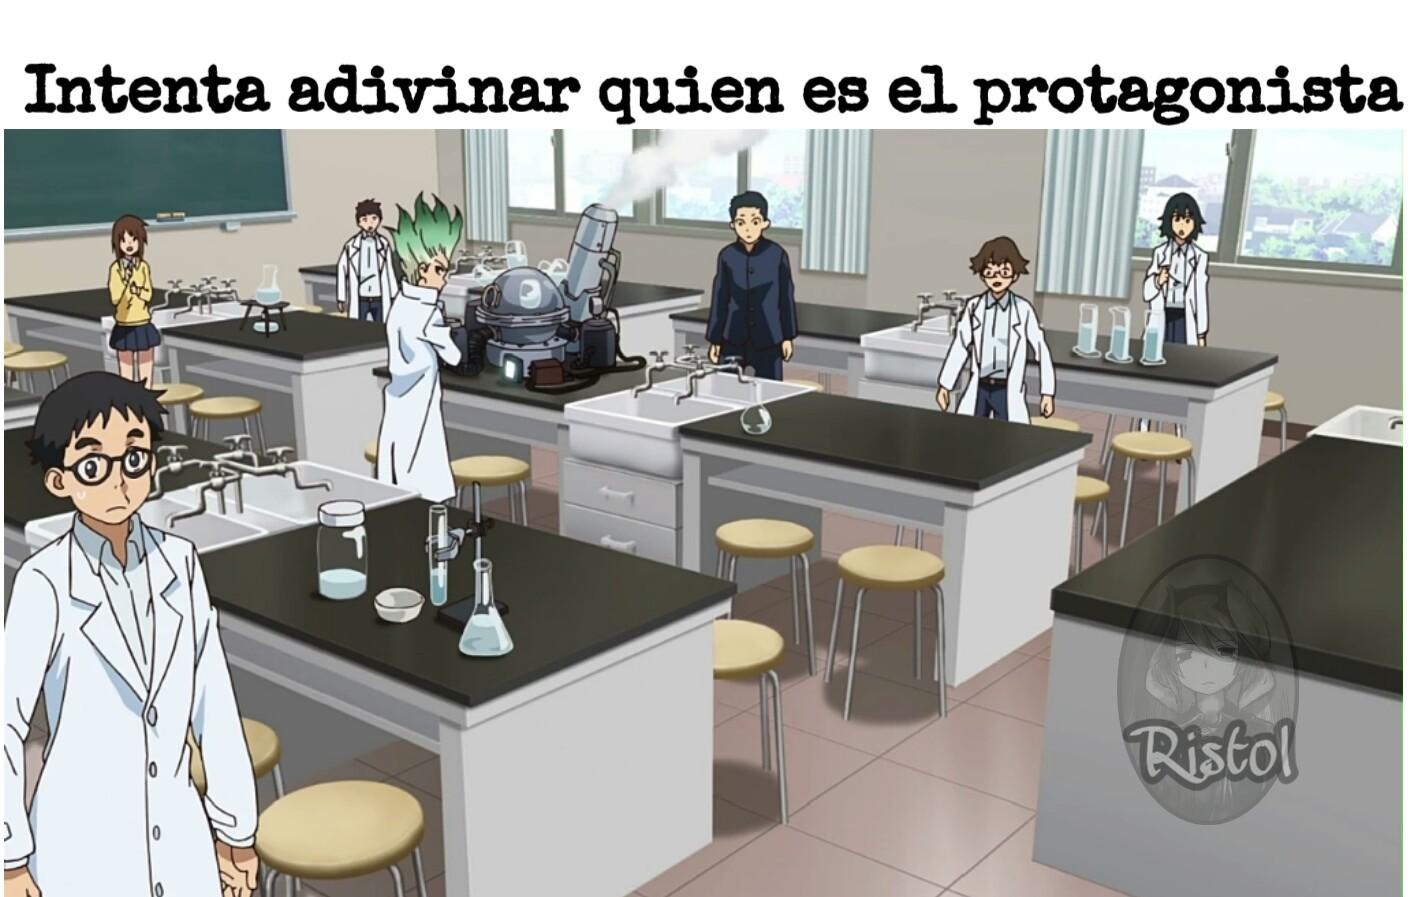 Dr.Stone - meme